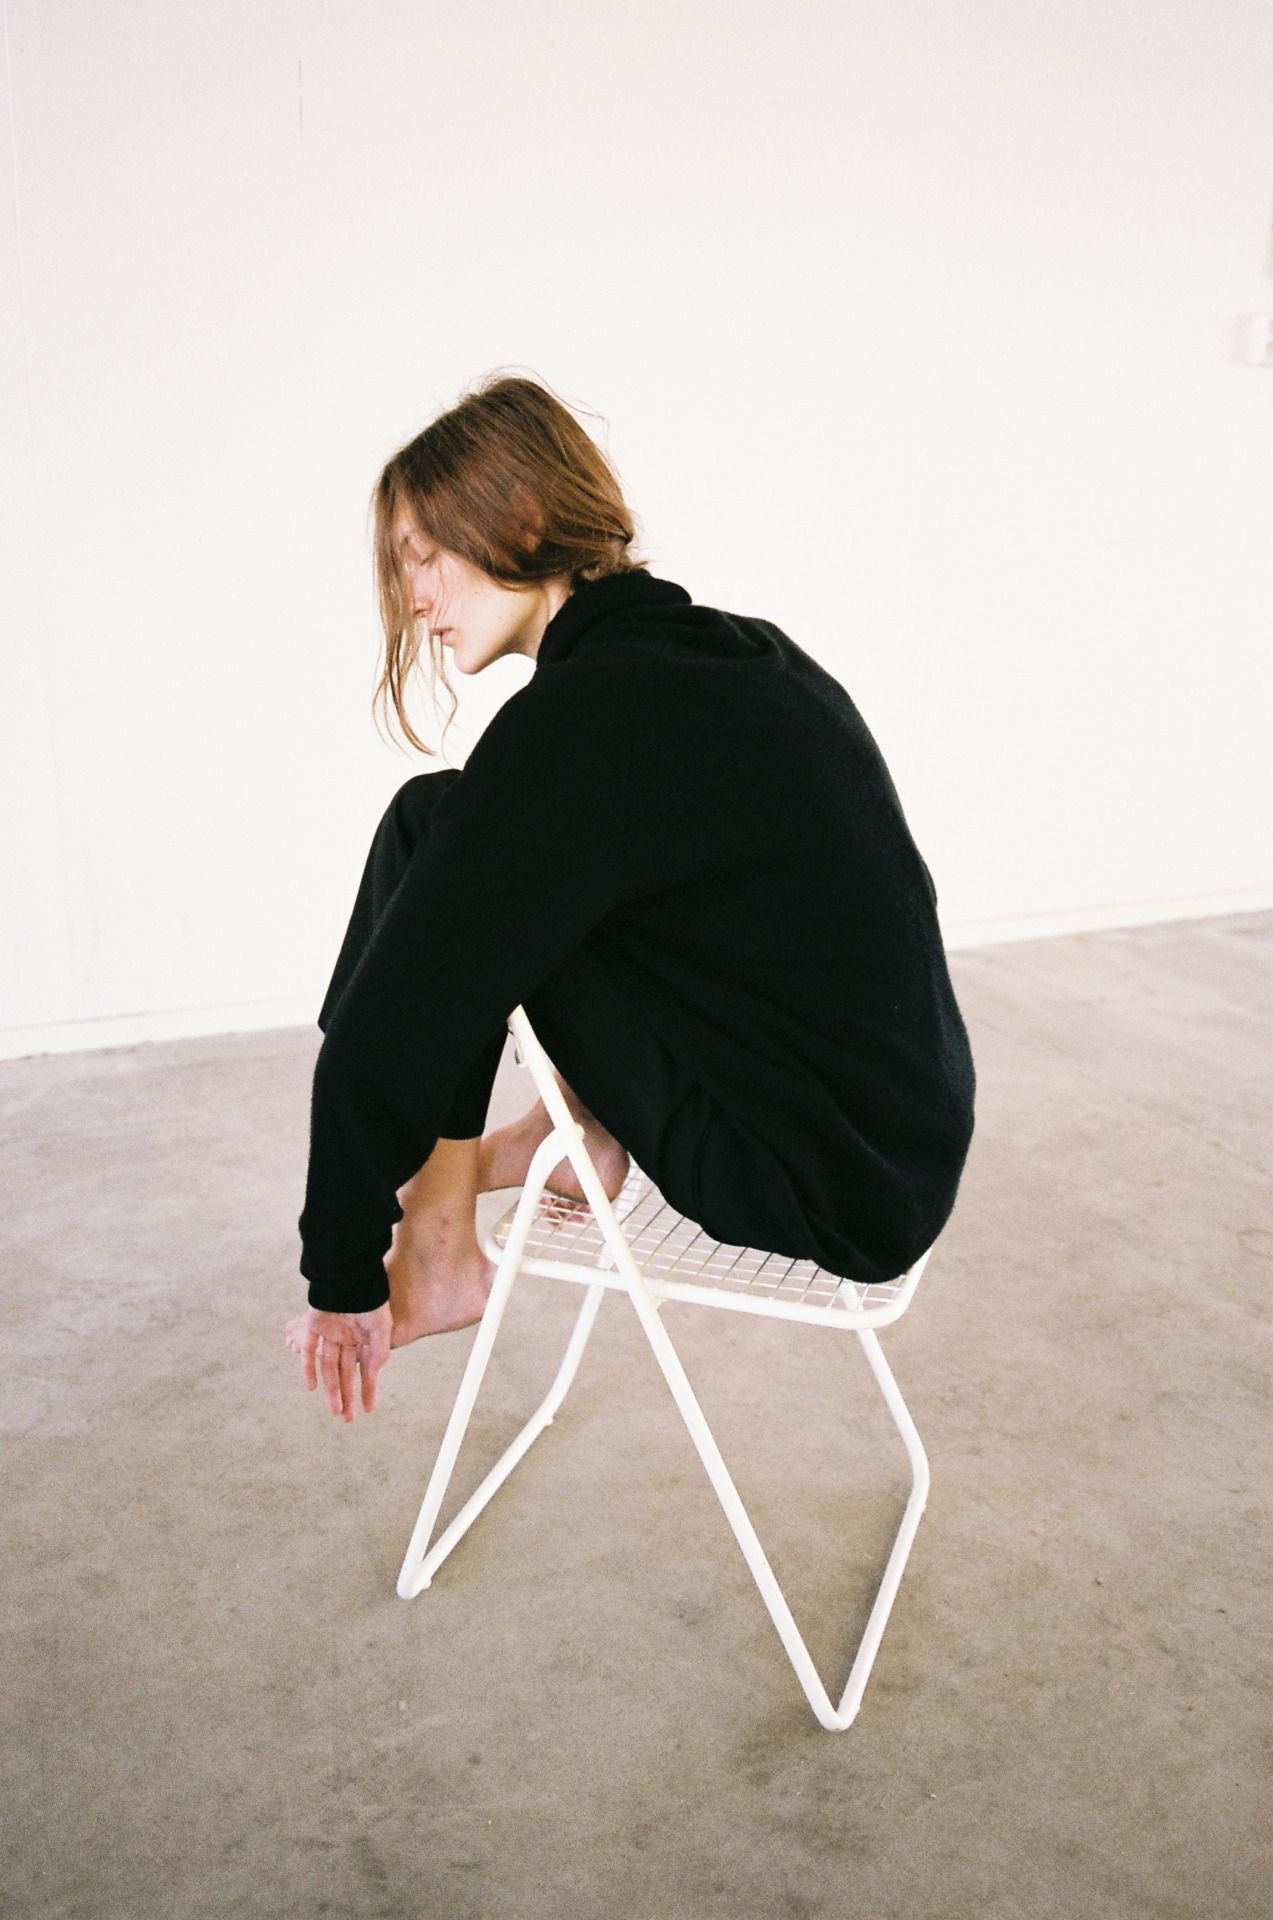 Pin by Karolina Hübner on Conceptual shoot Editorial